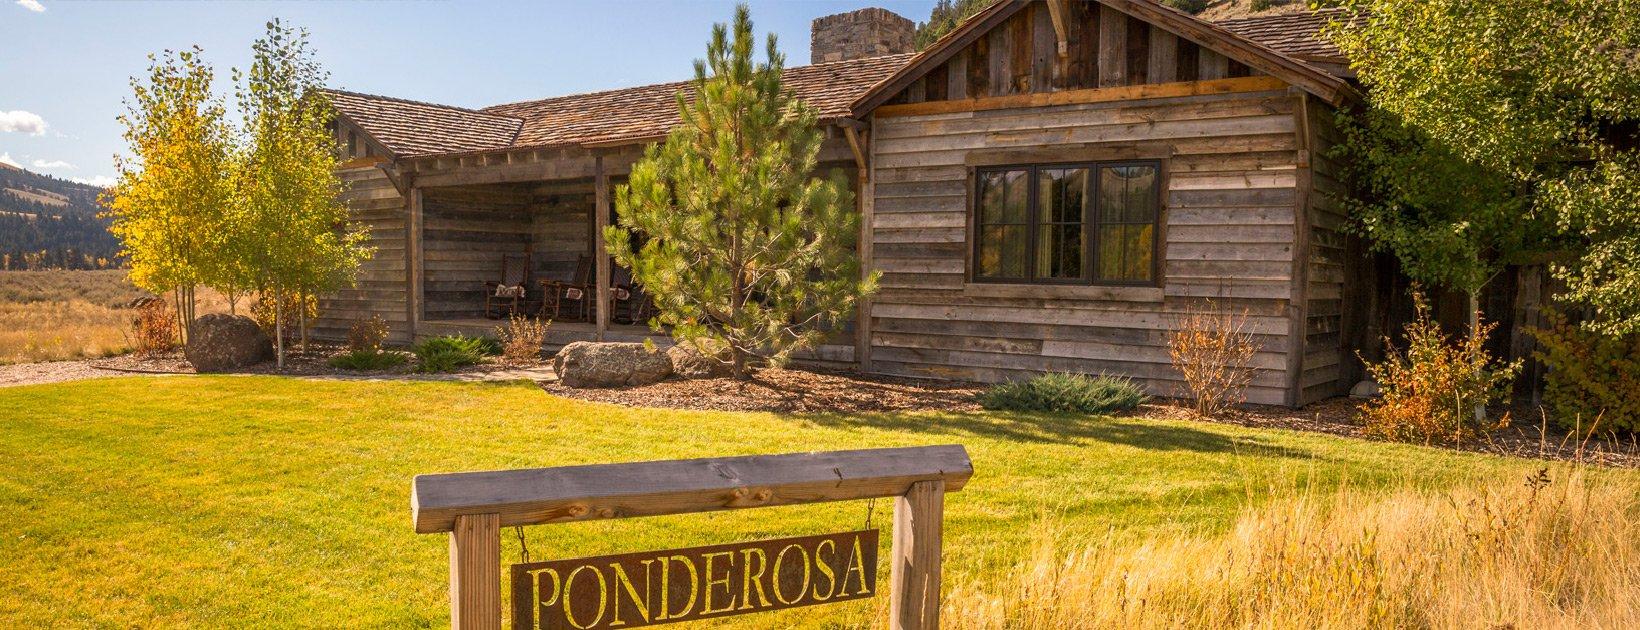 ponderosa-featured